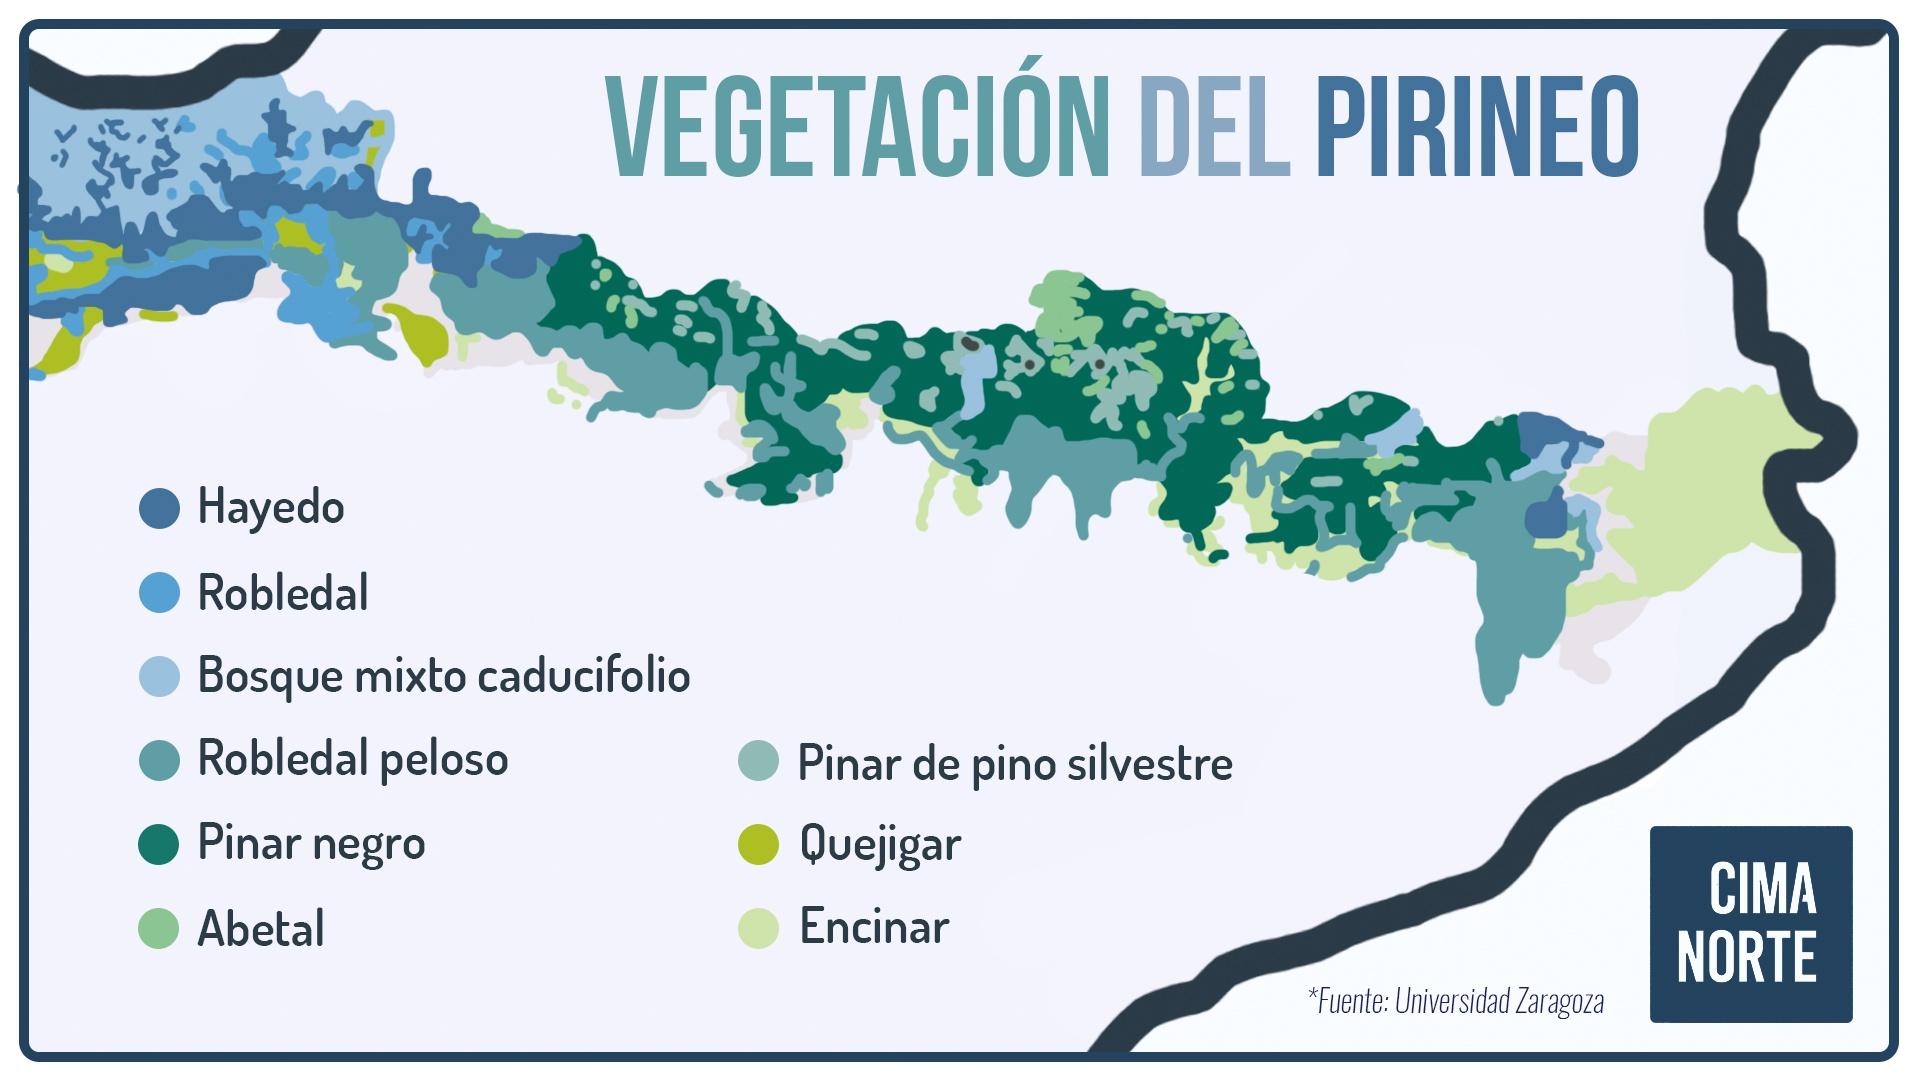 formaciones vegetales potenciales pirineo mapa vegetacion pirineo cima norte infografia